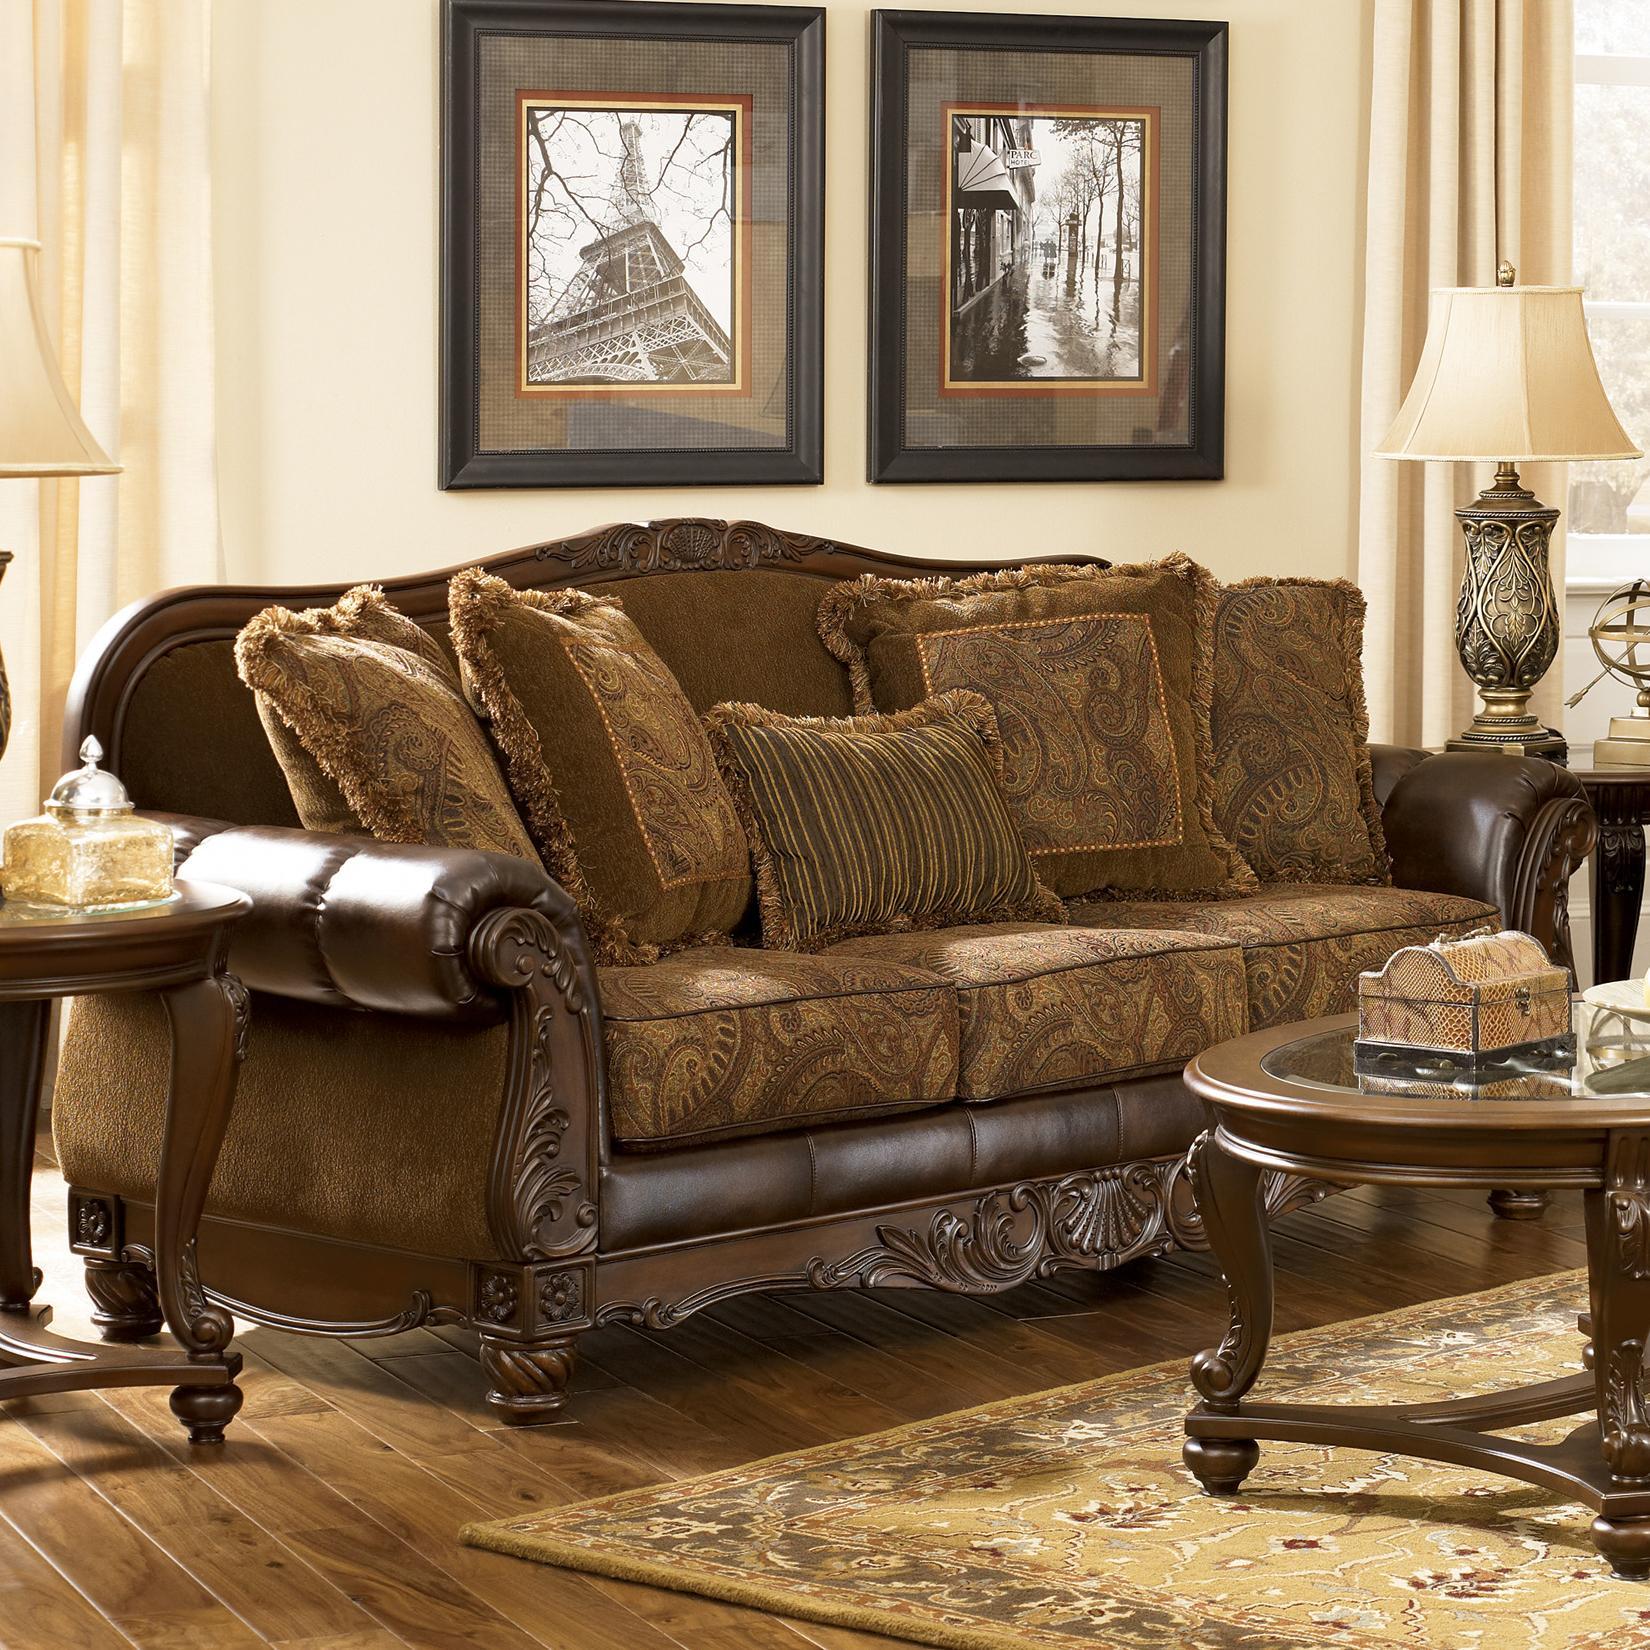 signature design by ashley fresco durablend antique 6310038 rh furnitureappliancemart com ashley fresco durablend antique sofa